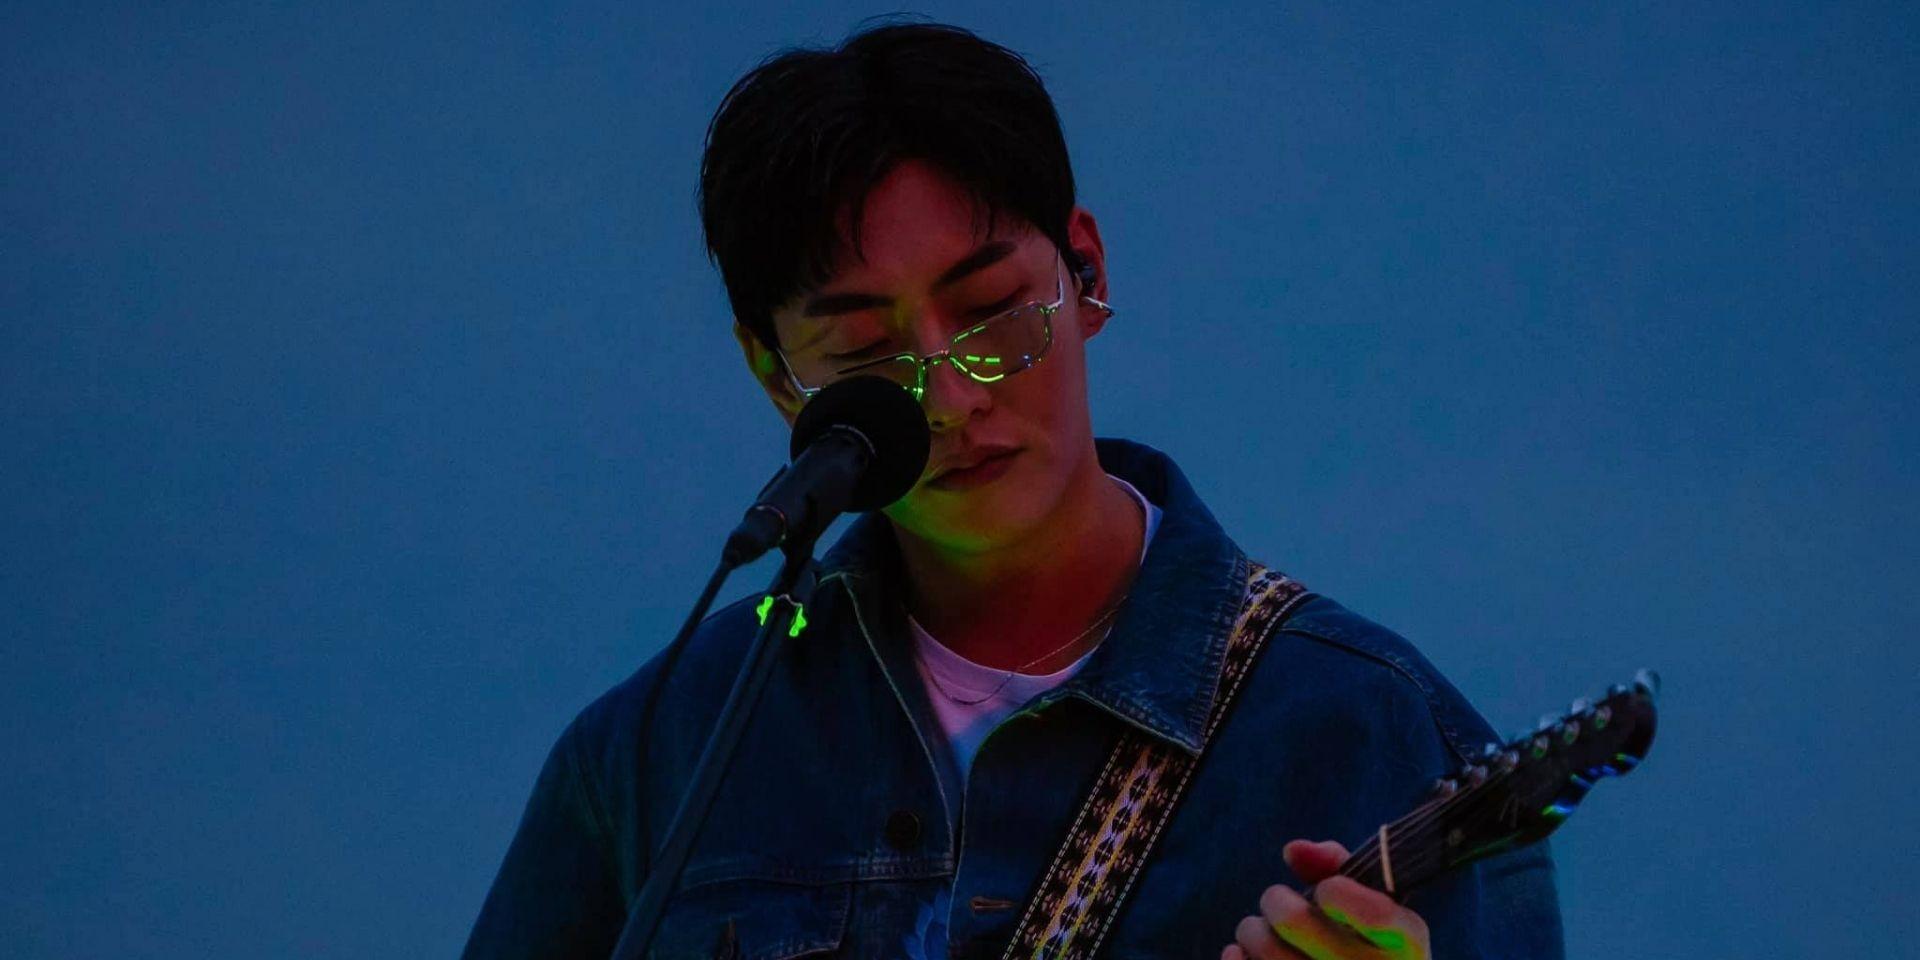 Korean singer-songwriter SHAUN returns with two brand-new singles under the '#0055b7' project — listen